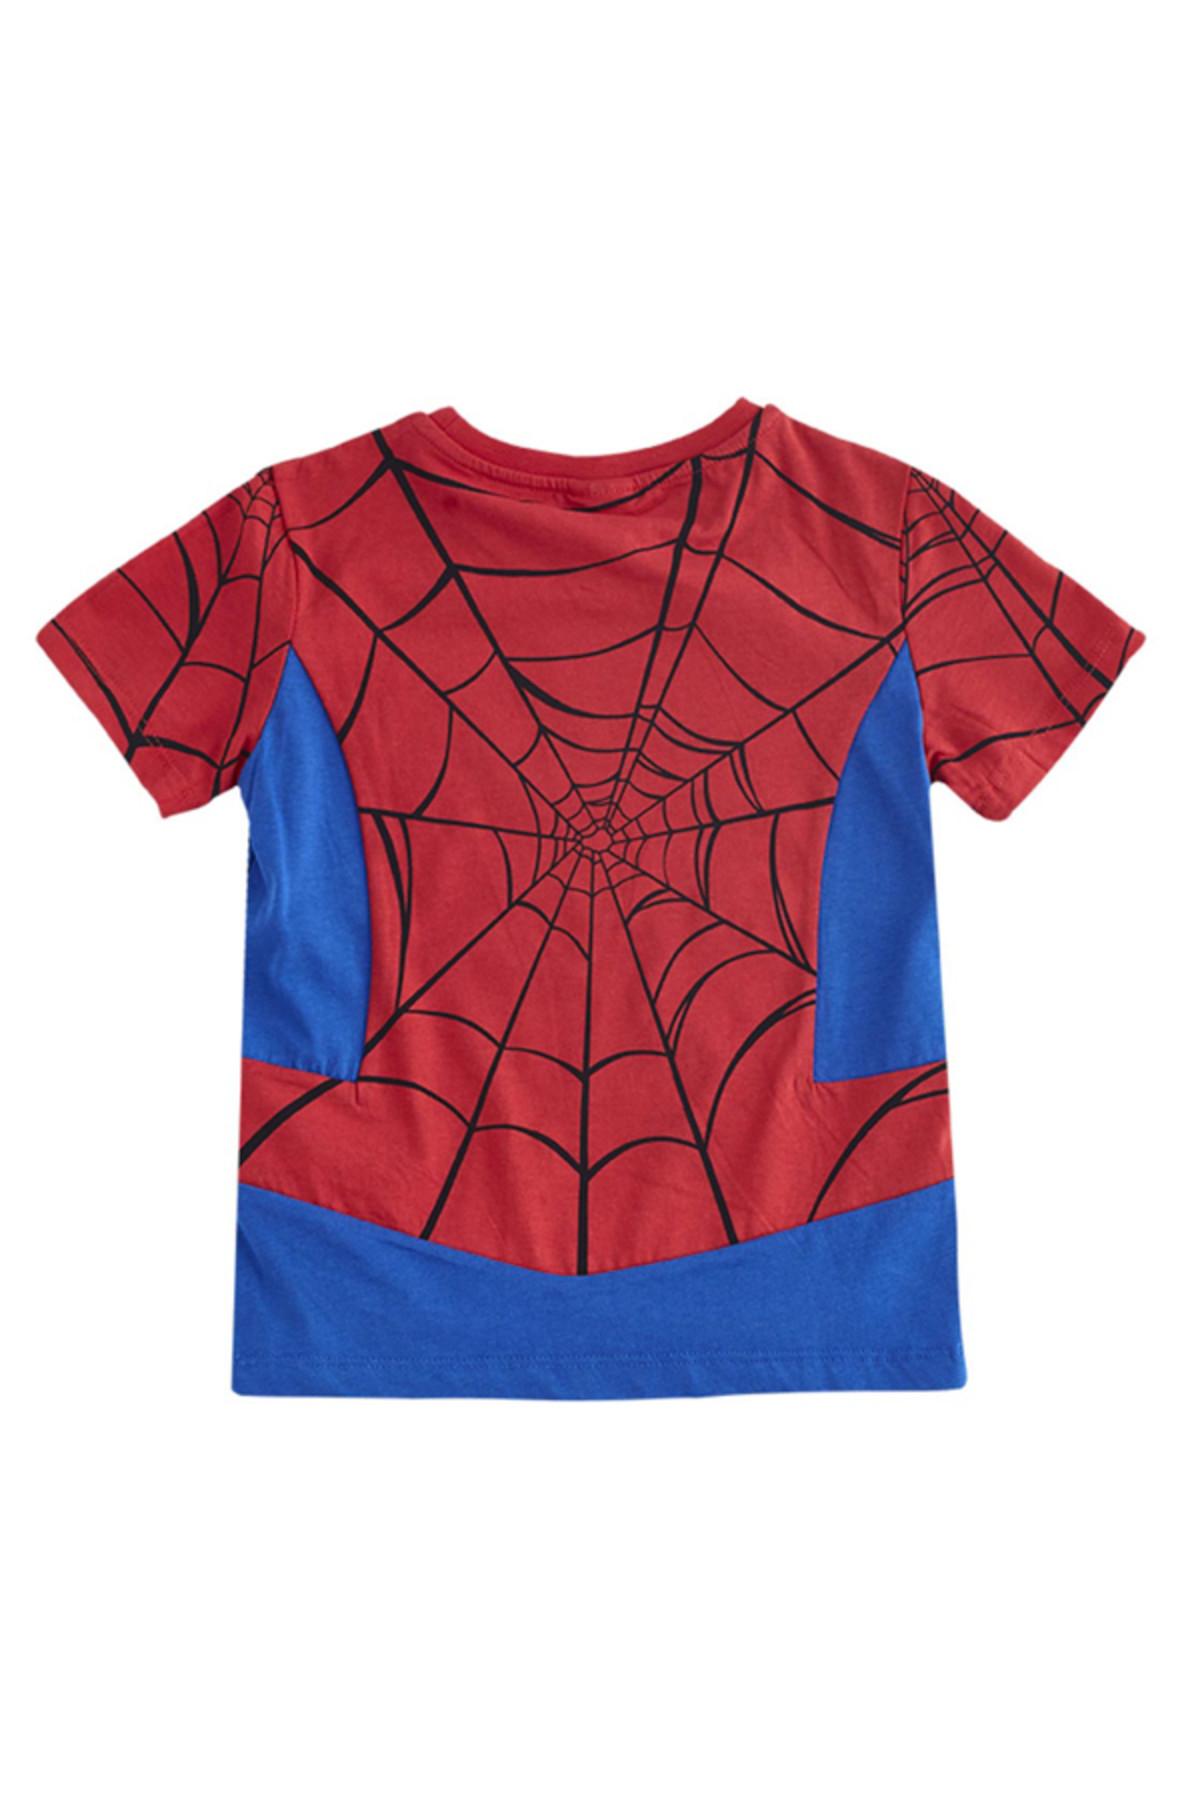 Soobe Ultimate Spider-Man Kısa Kol T-Shirt  Kırmızı   15YECTSRT1324_17-1563 2